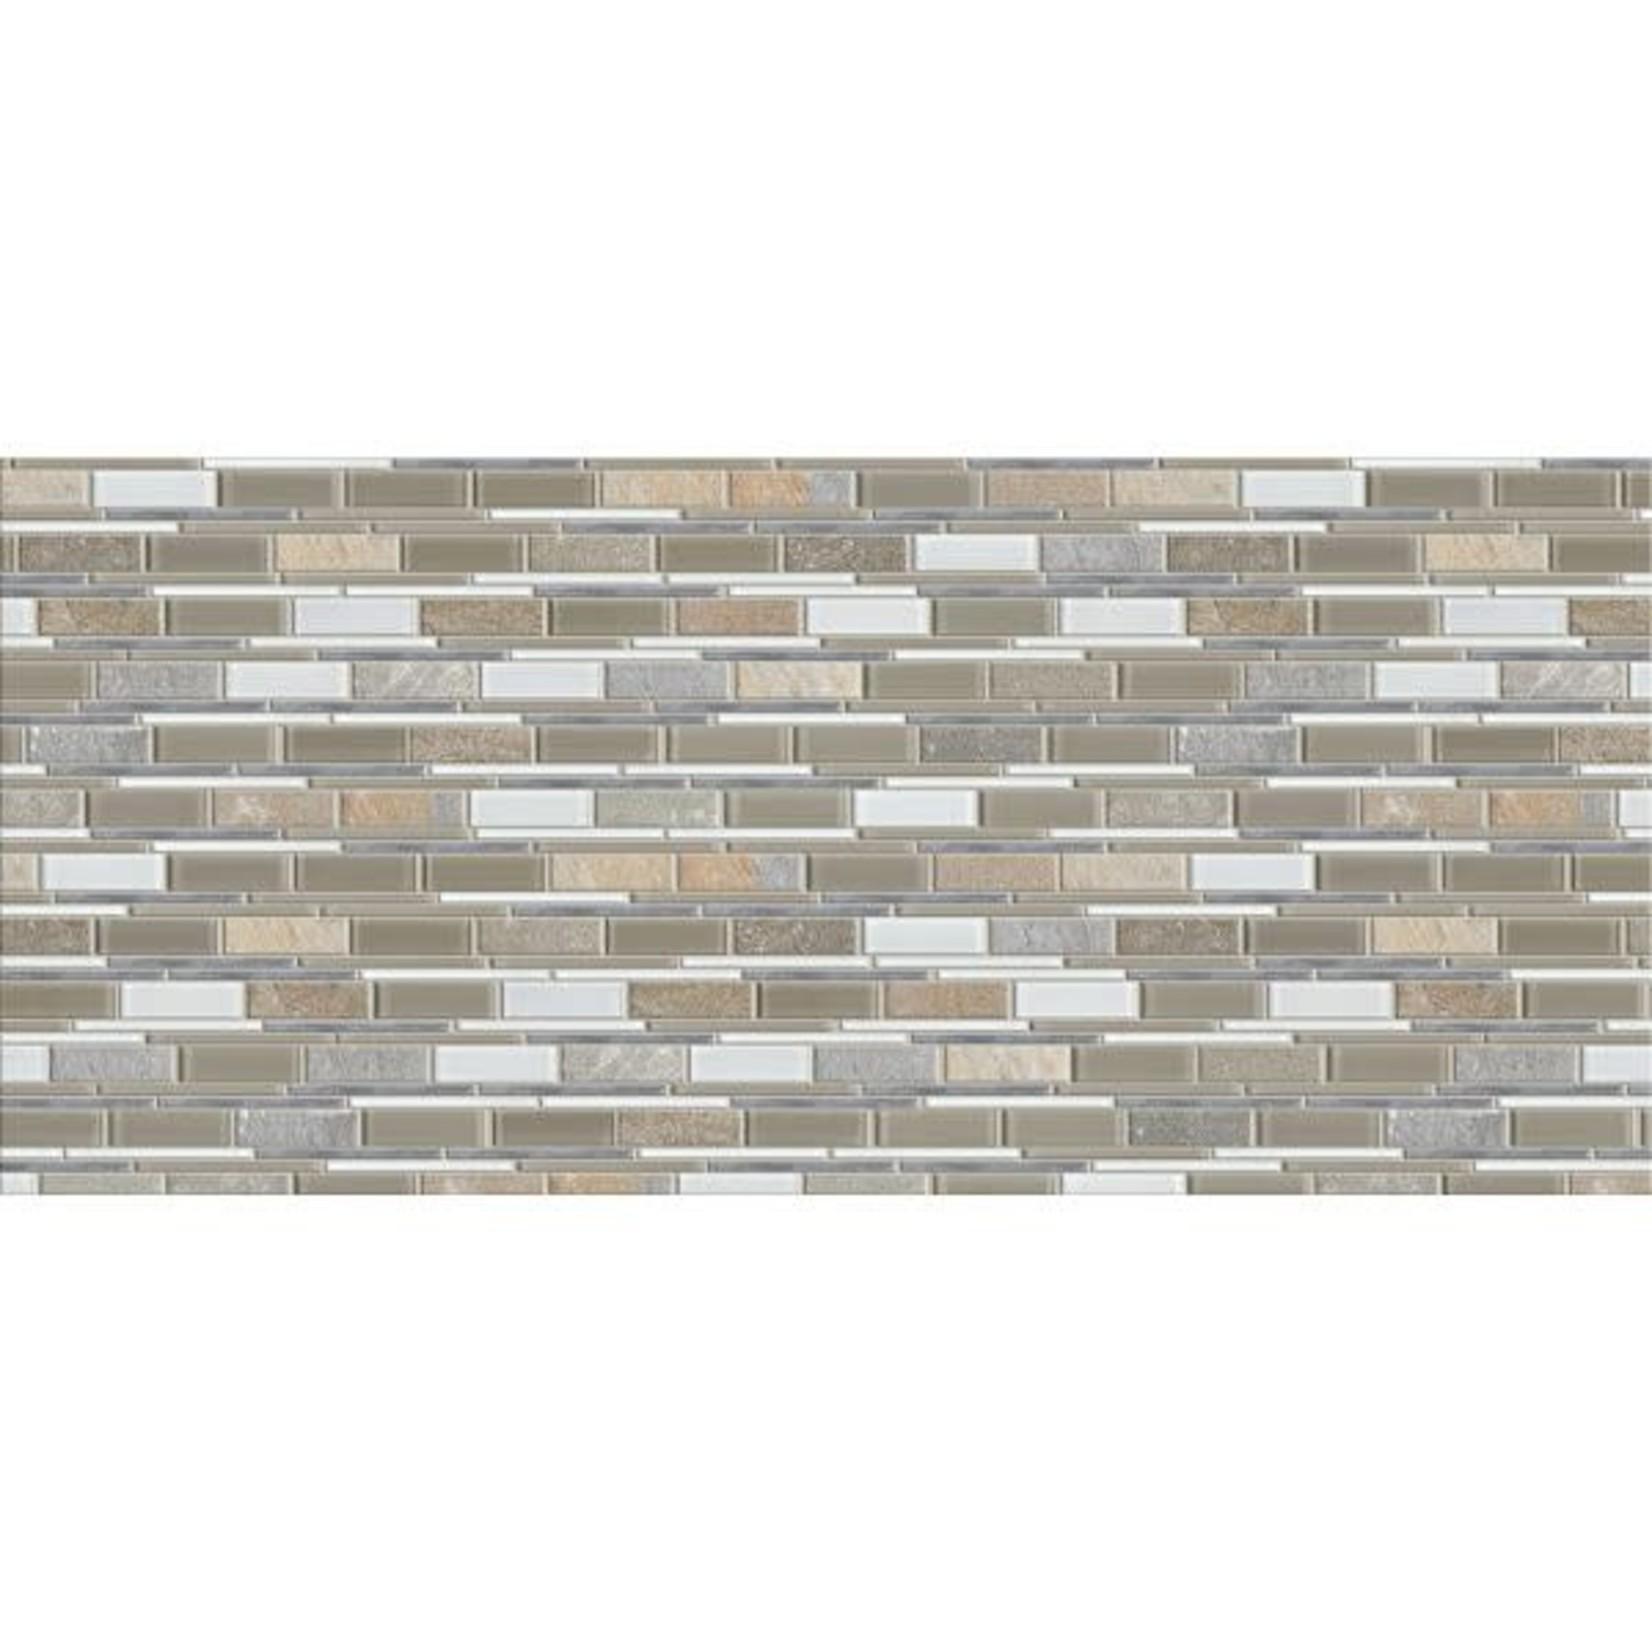 Golden Select Glass, Stone and Aluminum Mosaic Wall Tiles -Colorado 38.9x30.9cm 5 Tiles/box